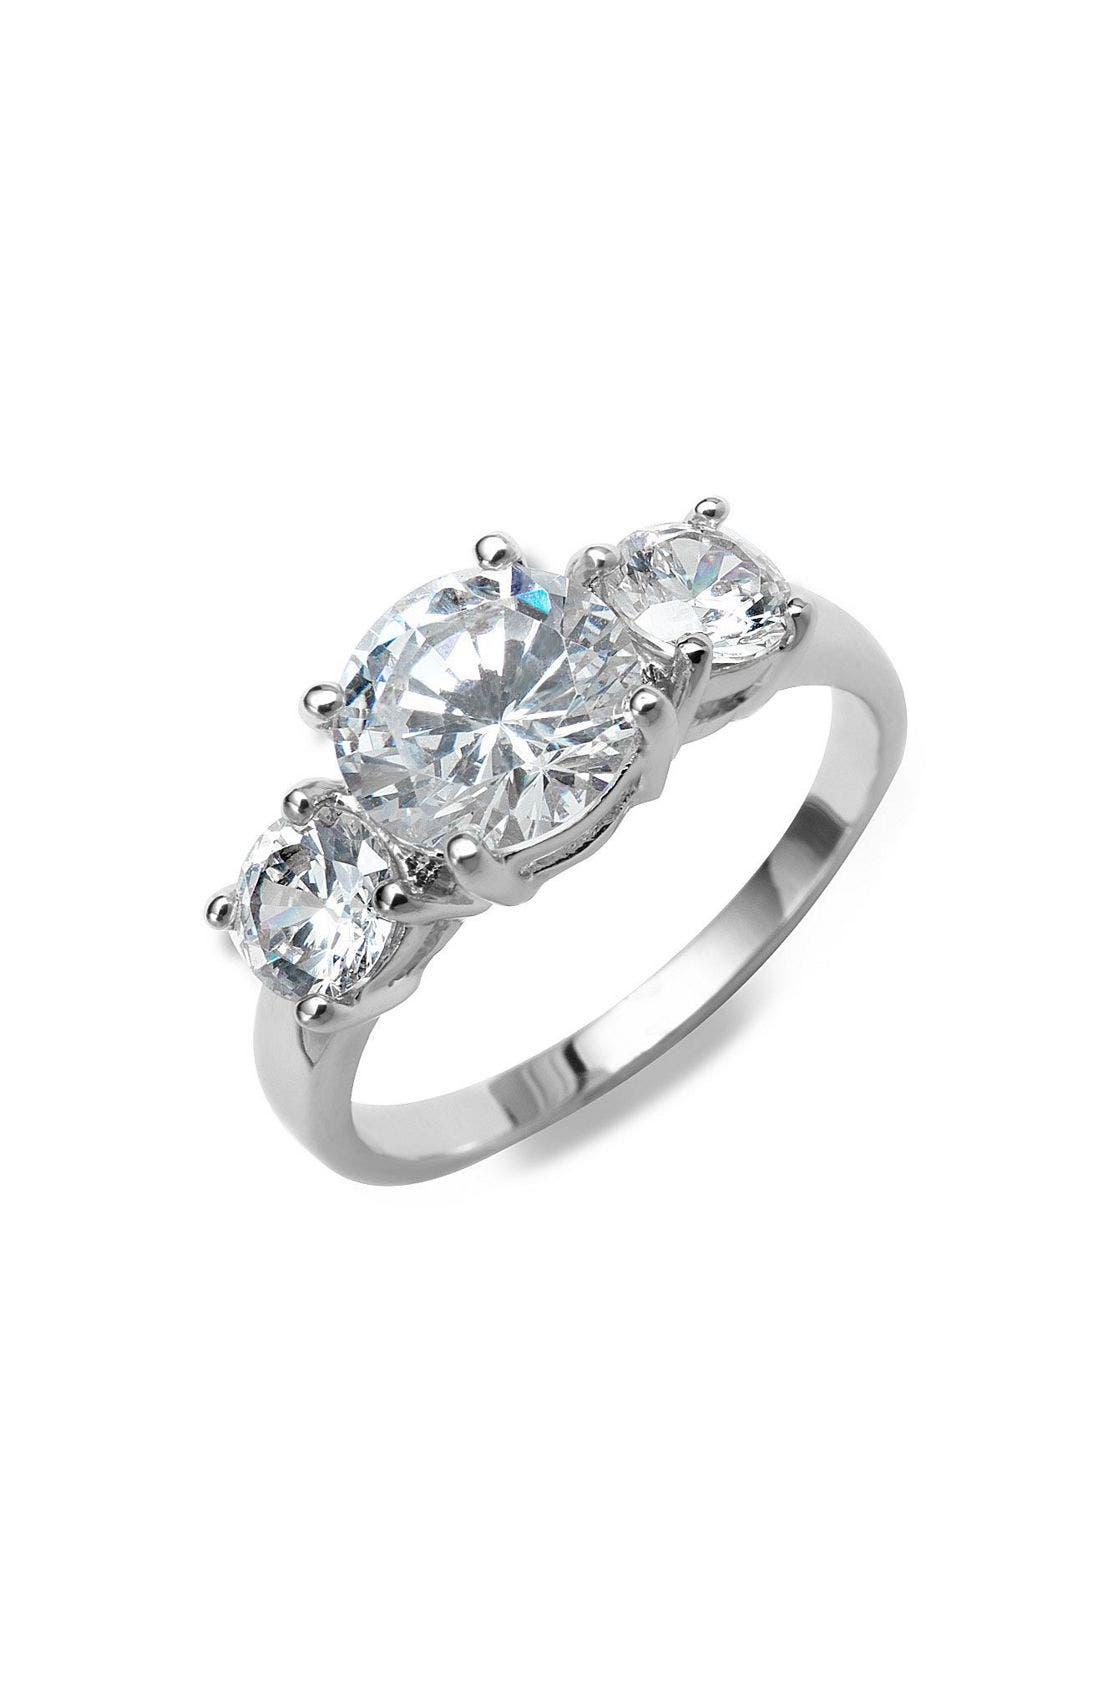 Main Image - Ariella Three-Stone Ring